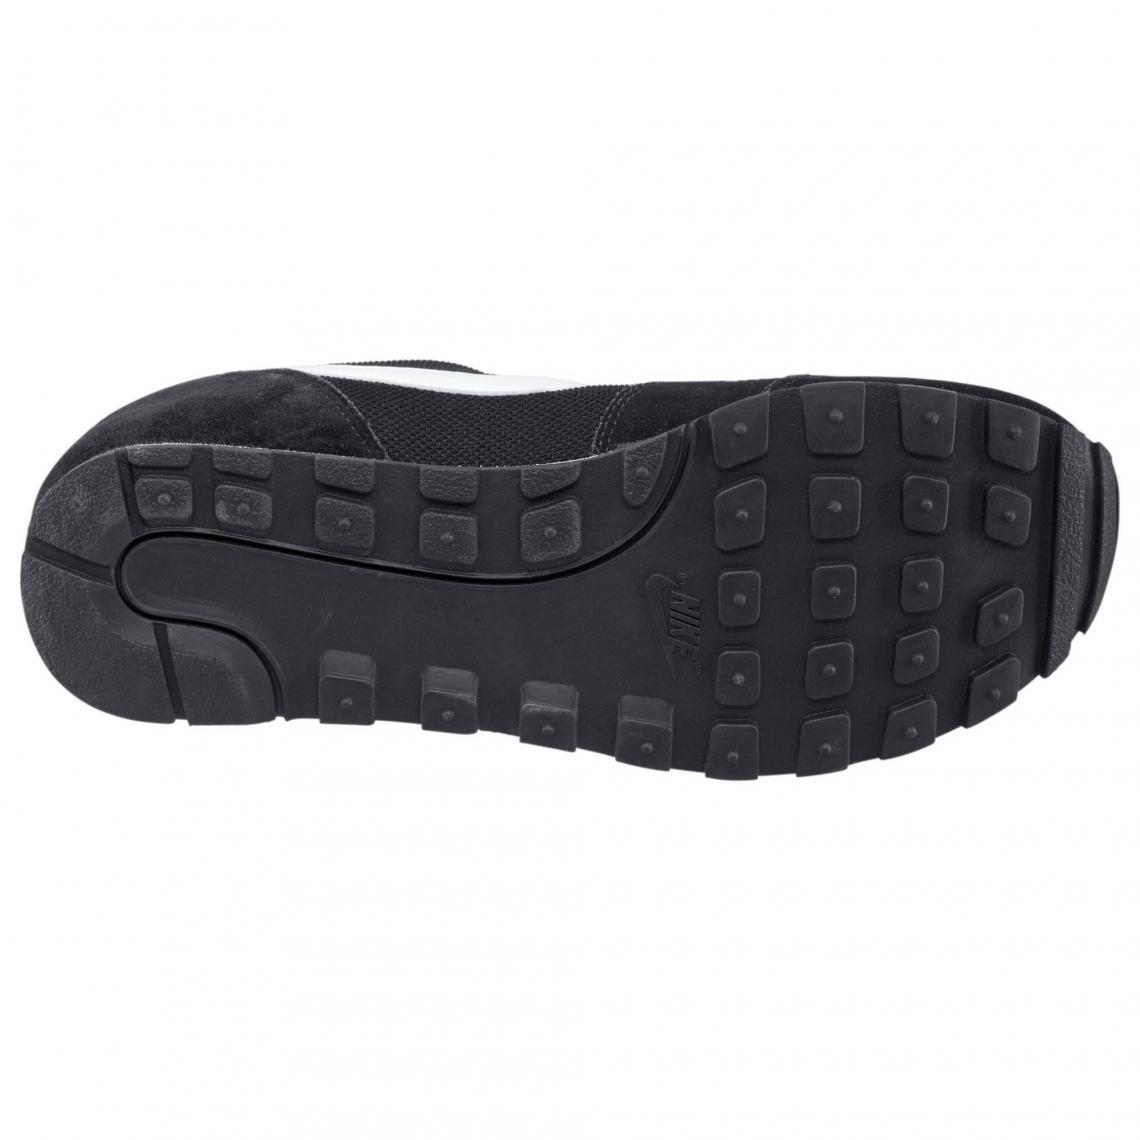 Nike MD Runner 2 chaussures de tennis homme - Noir - Blanc   3Suisses 9f5777f2cdda